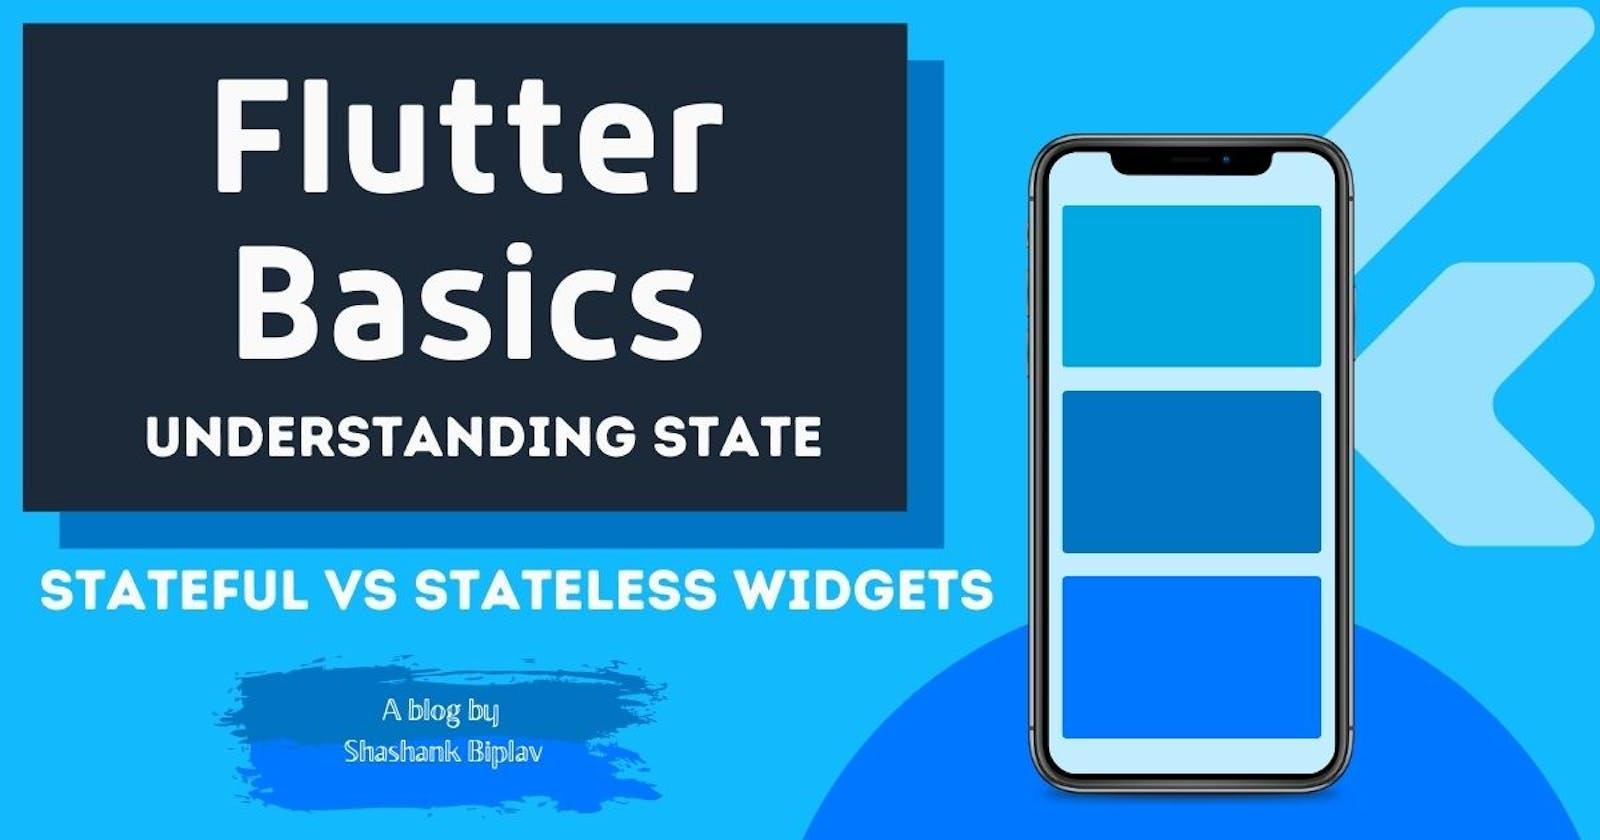 Flutter Basics - Understanding State